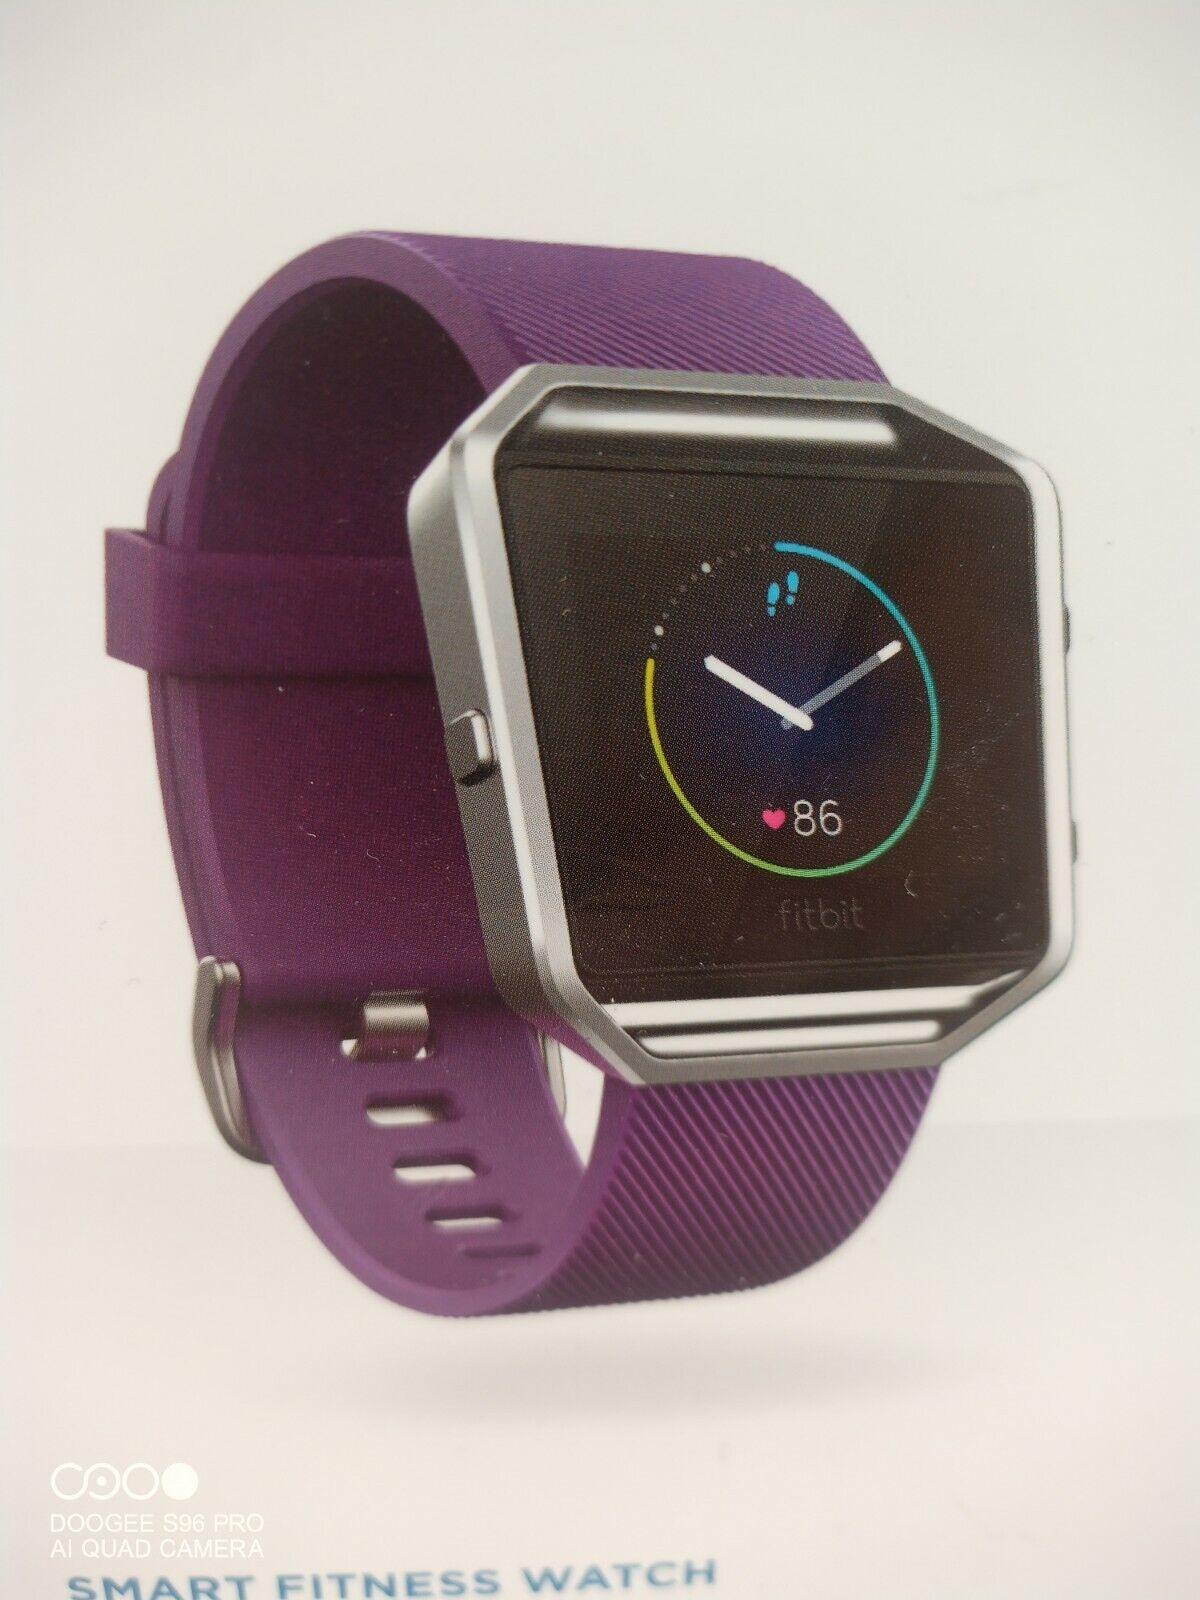 Fitbit Blaze Smart Fitness Watch Activity Tracker Purple Large Band Good Conditi